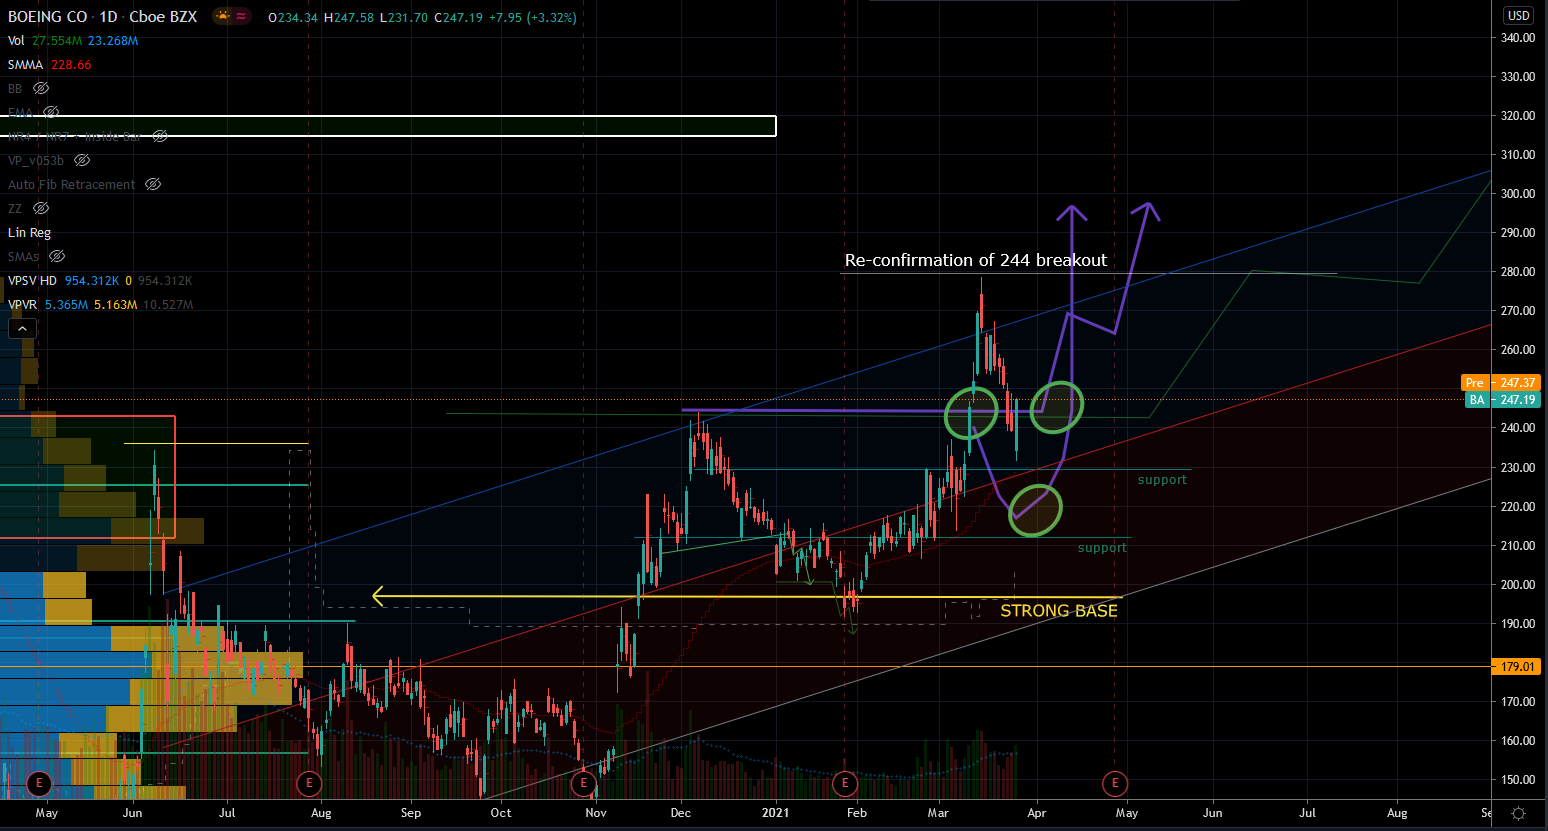 BA Stock (BA) Stock Chart Showing Breakout Opportunity